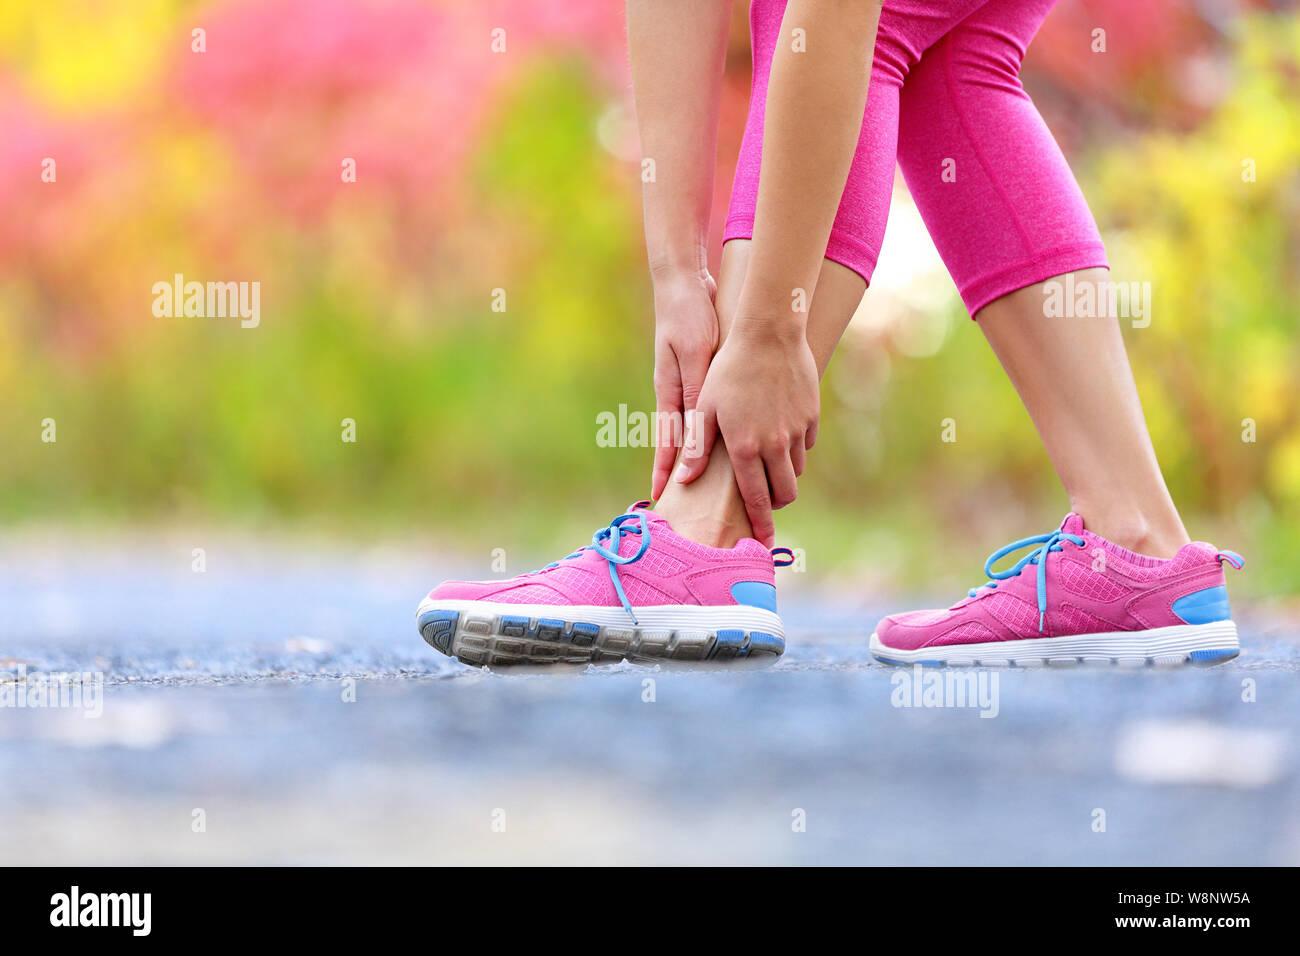 Running sport injury - twisted broken ankle  Female athlete